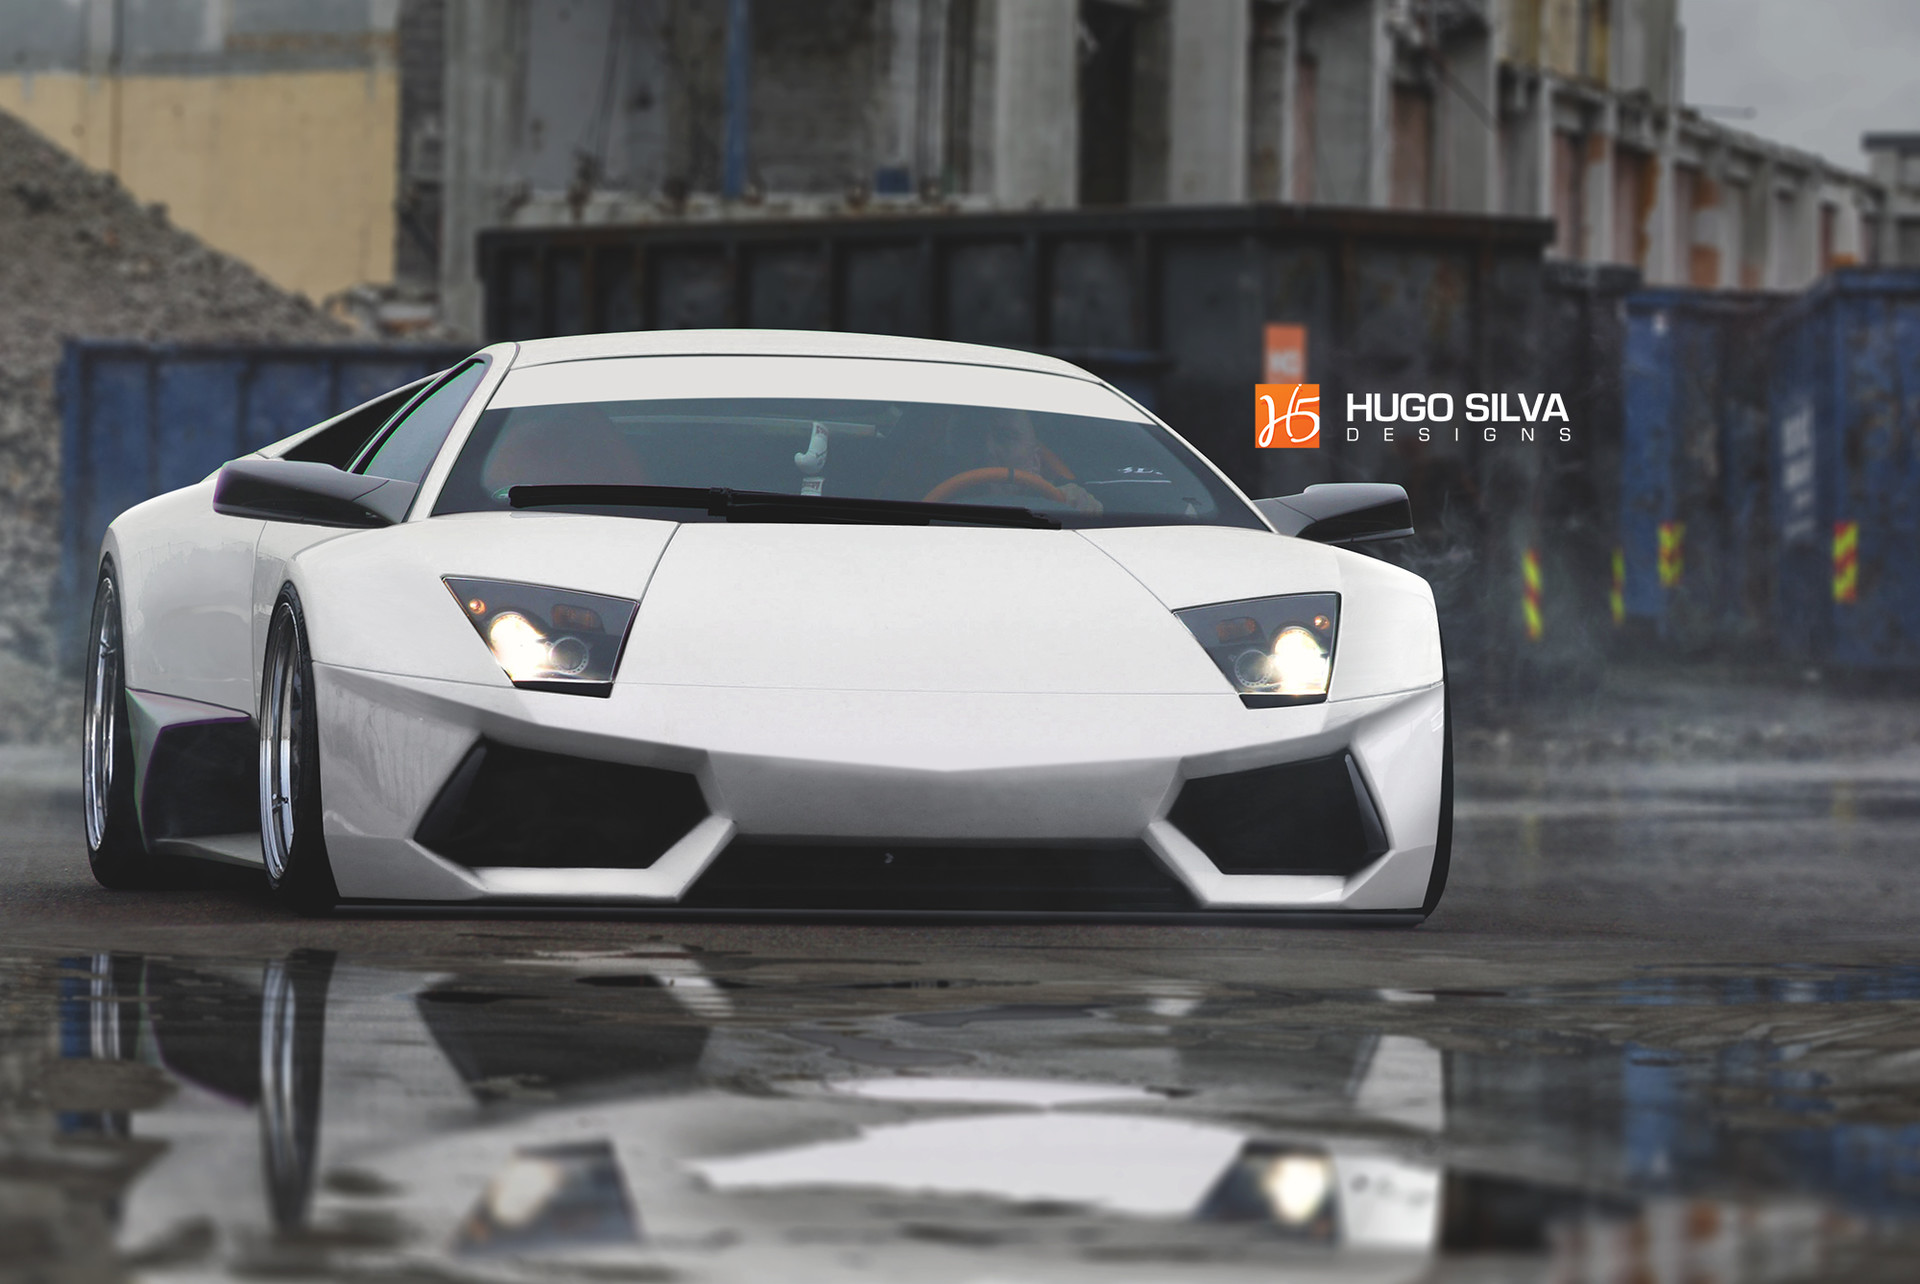 Hugo Silva Lamborghini Murcielago Widebody